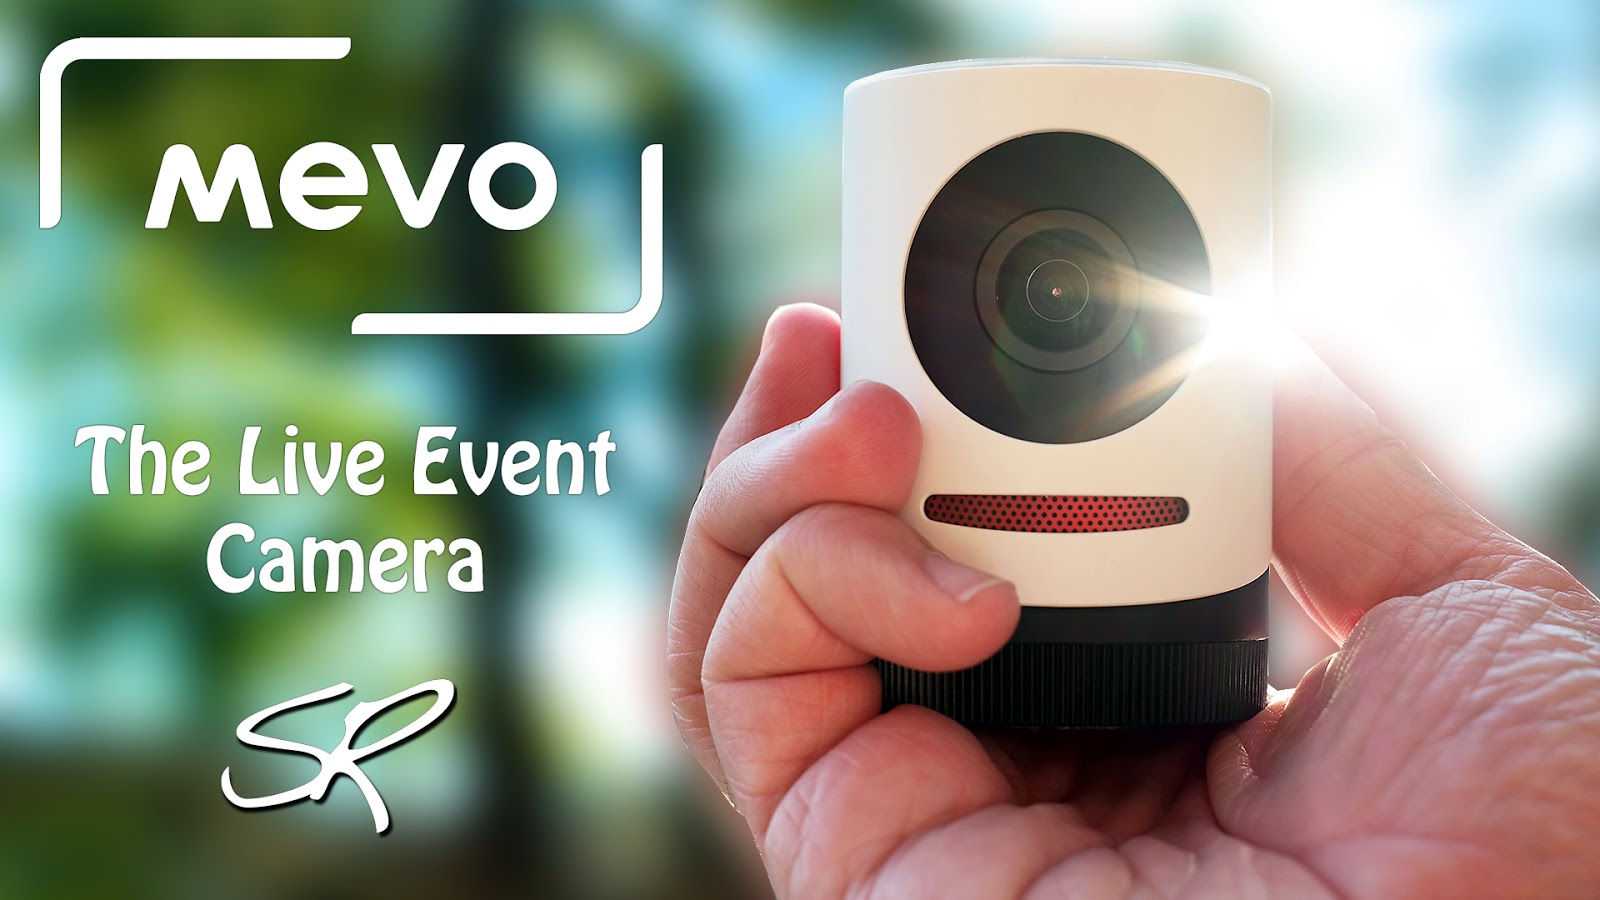 meet mevo the live event camera